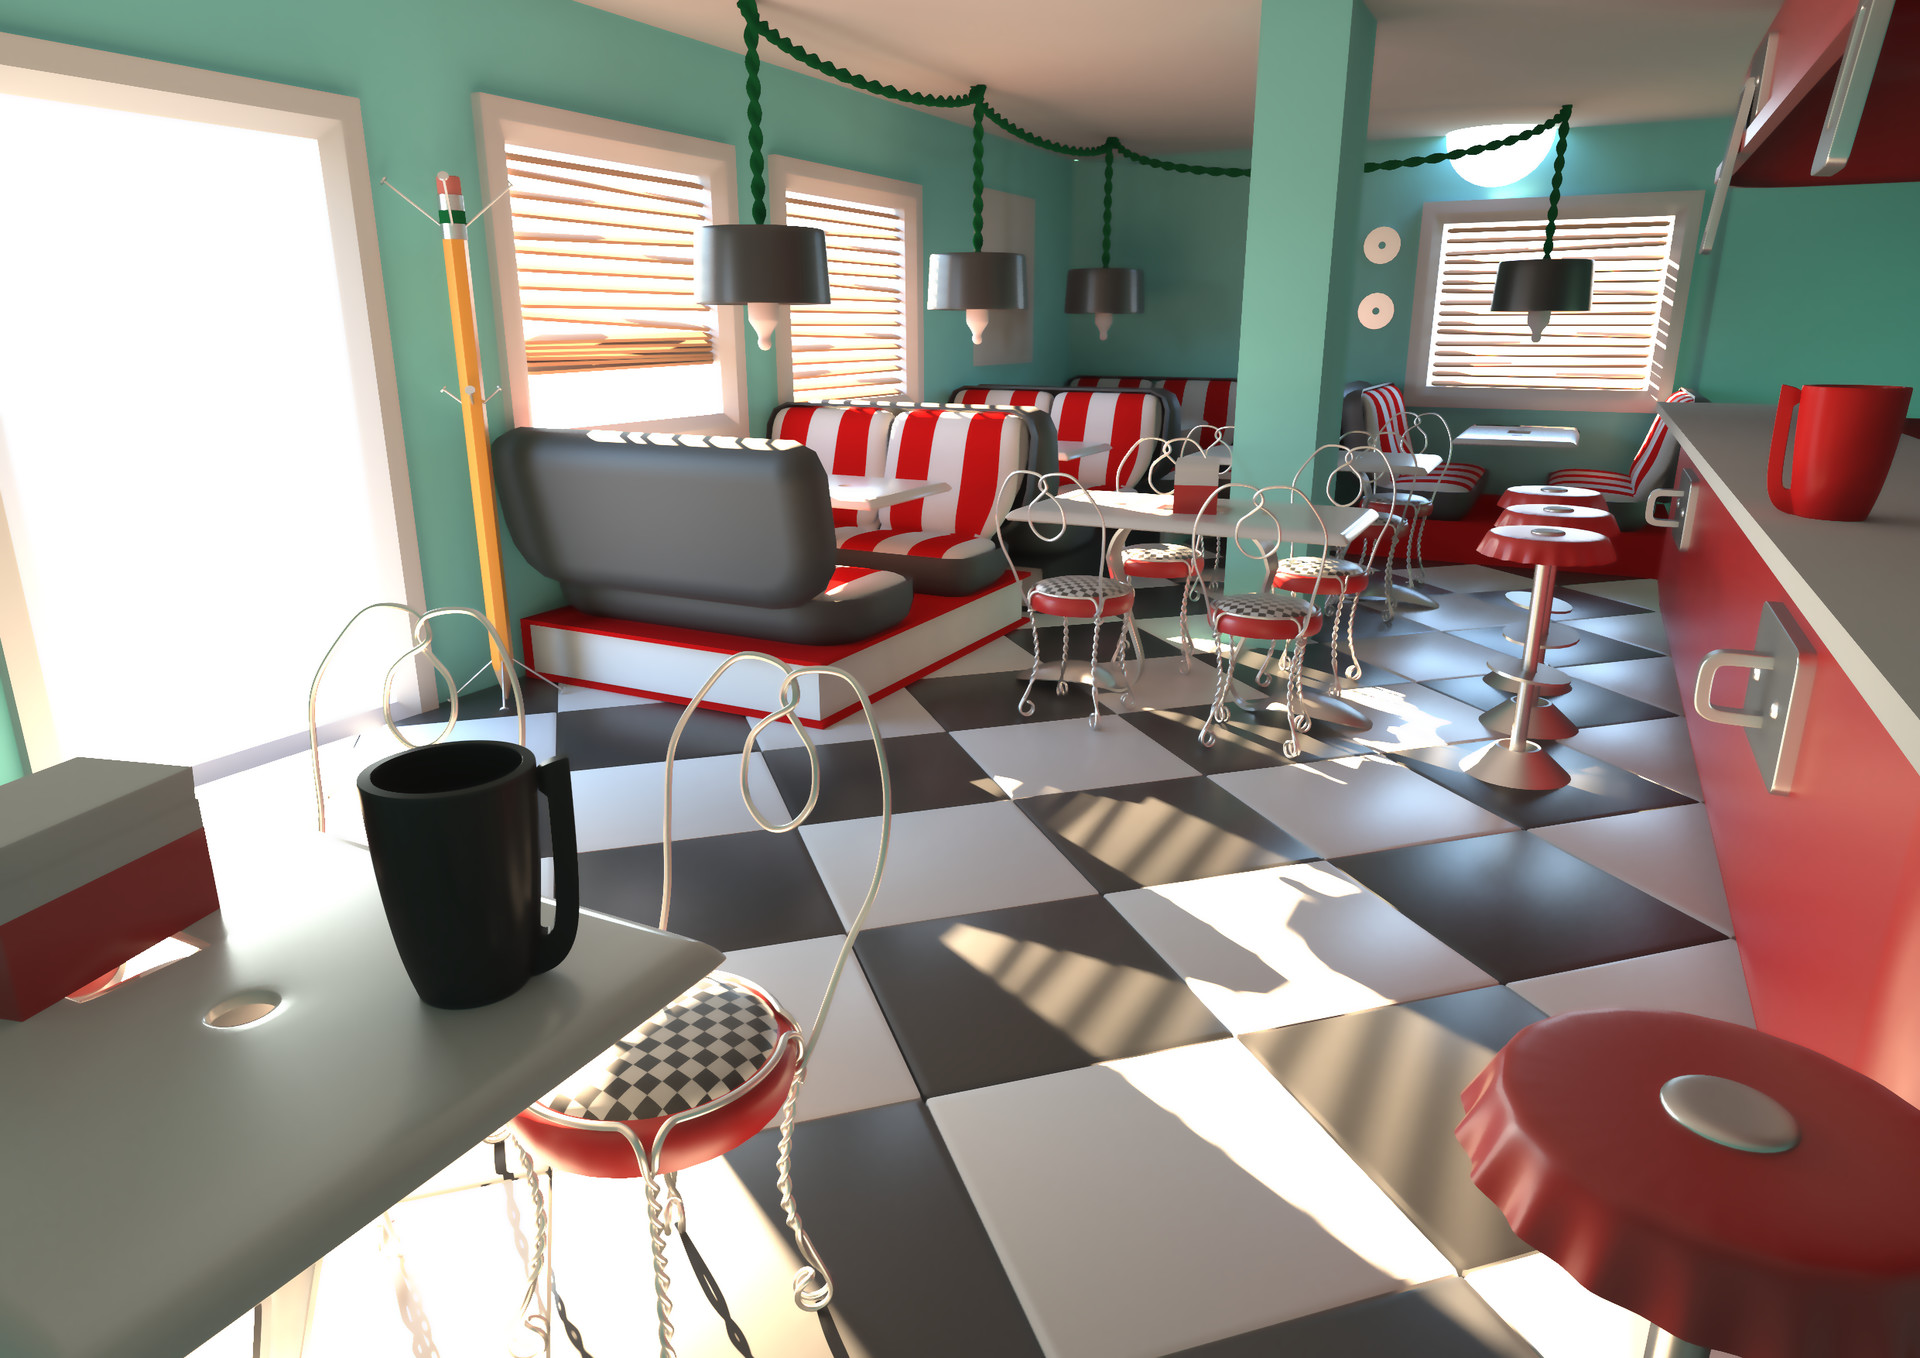 Diner scene - 3D Render in 3DS Max with V-Ray